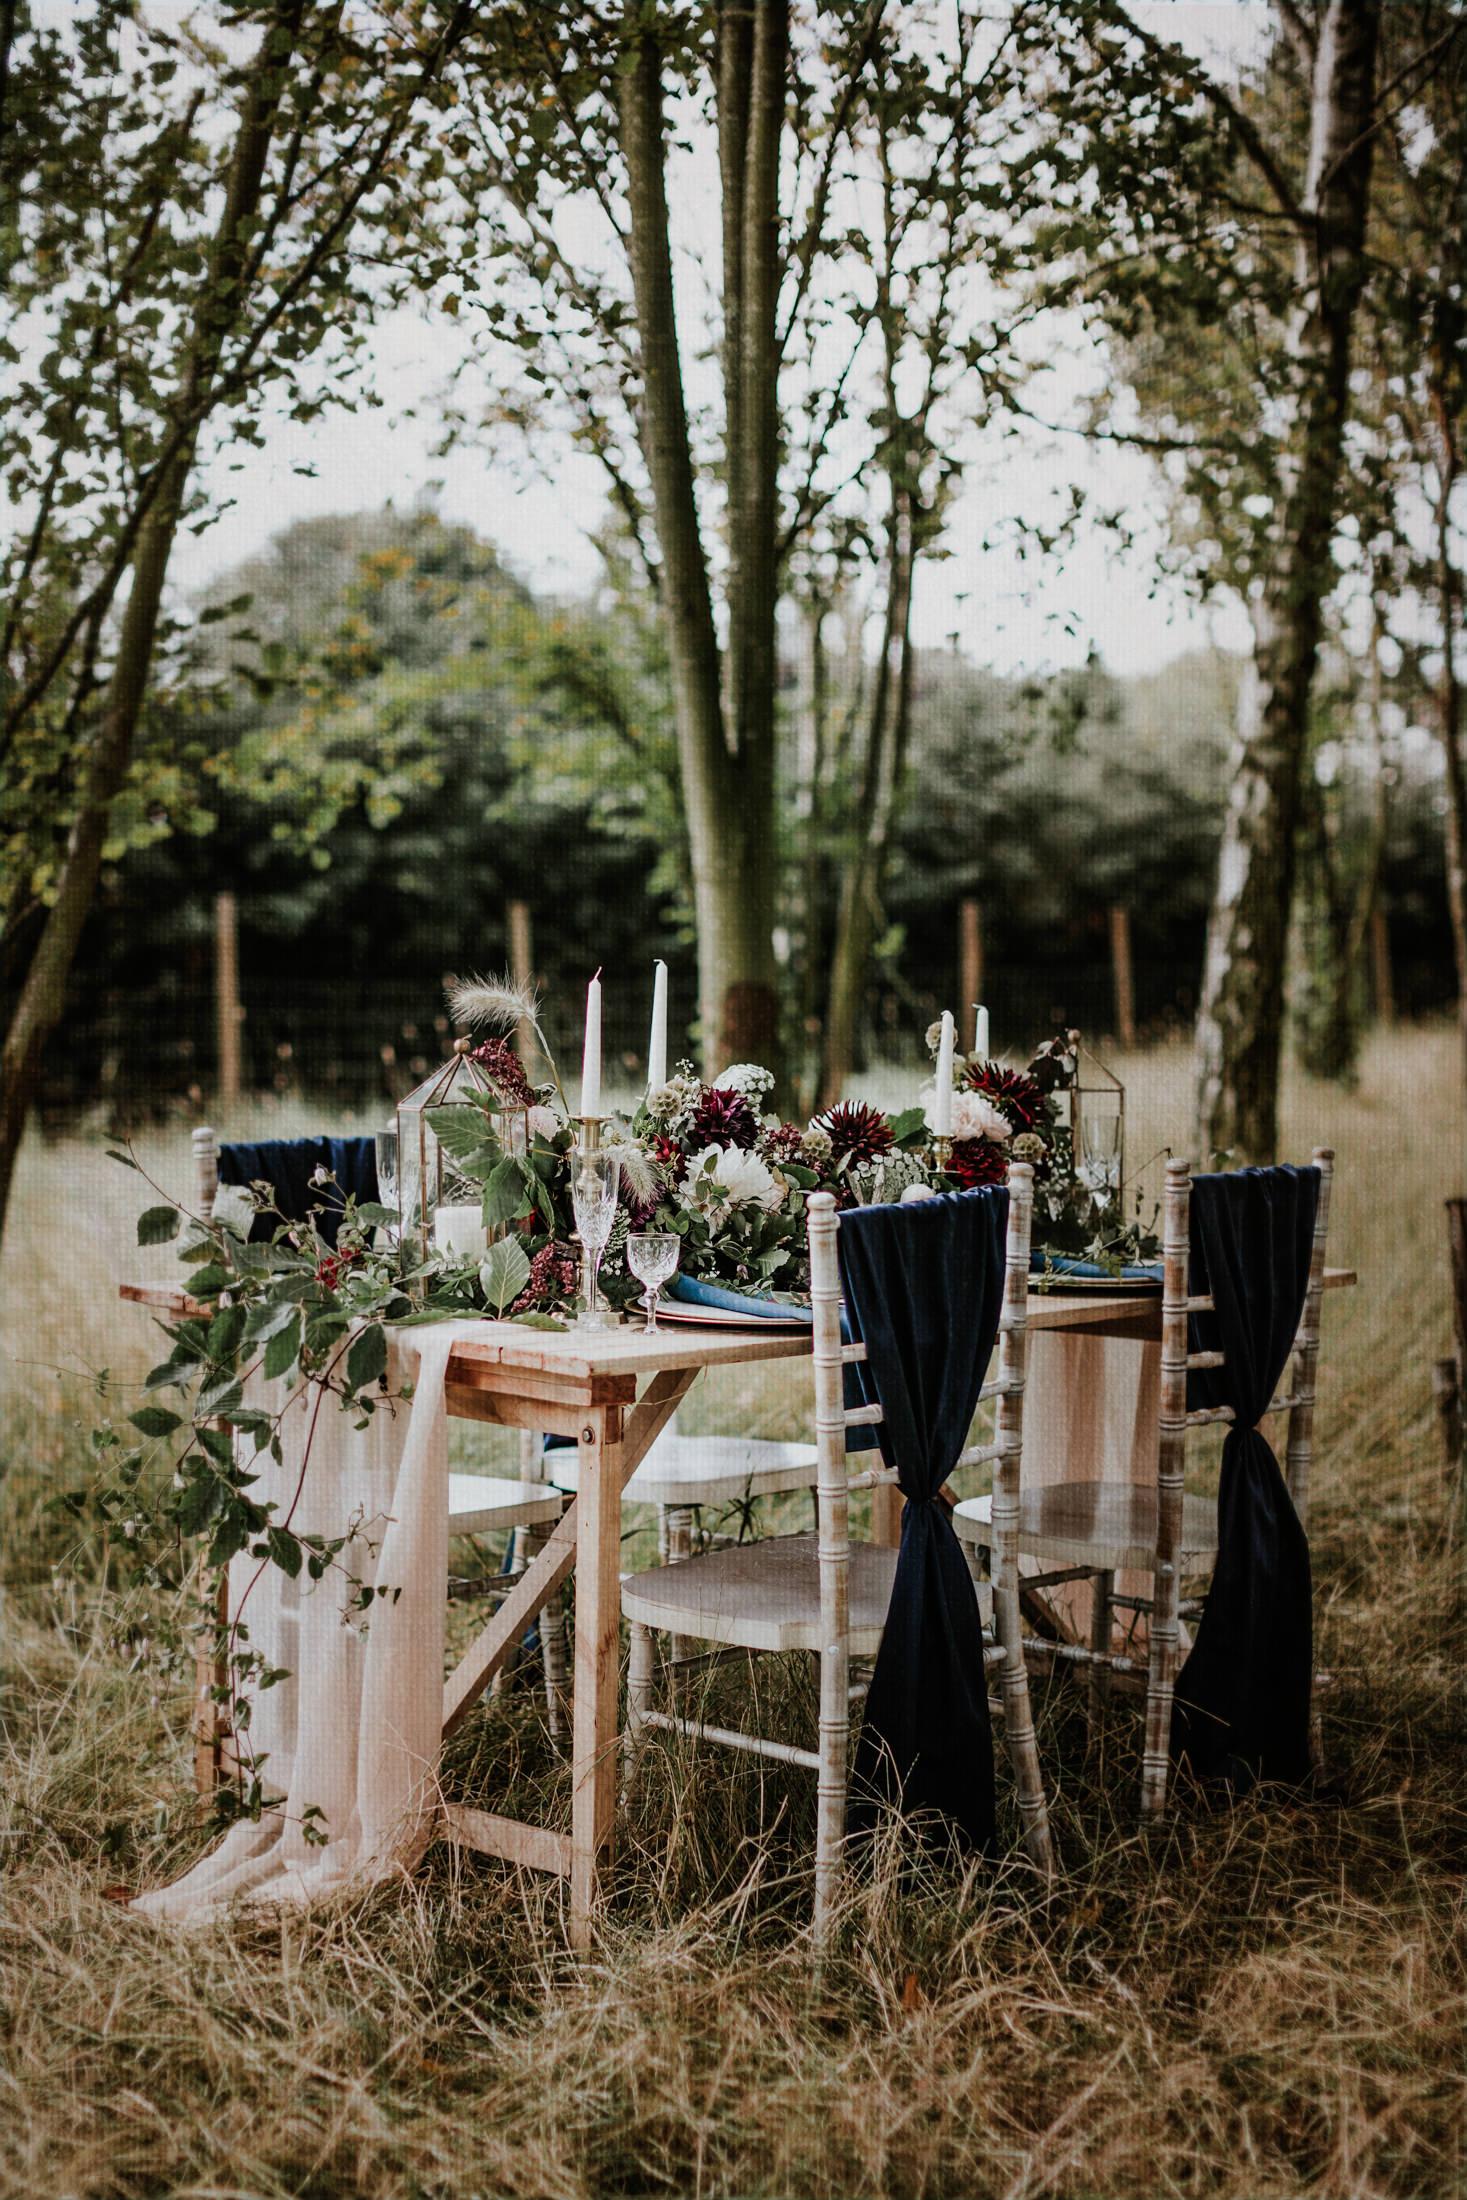 Woodland Wedding - nottingham outdoor wedding venue - east midlands wedding planner - outdoor wedding styling - bohemian forest wedding - outdoor wedding table